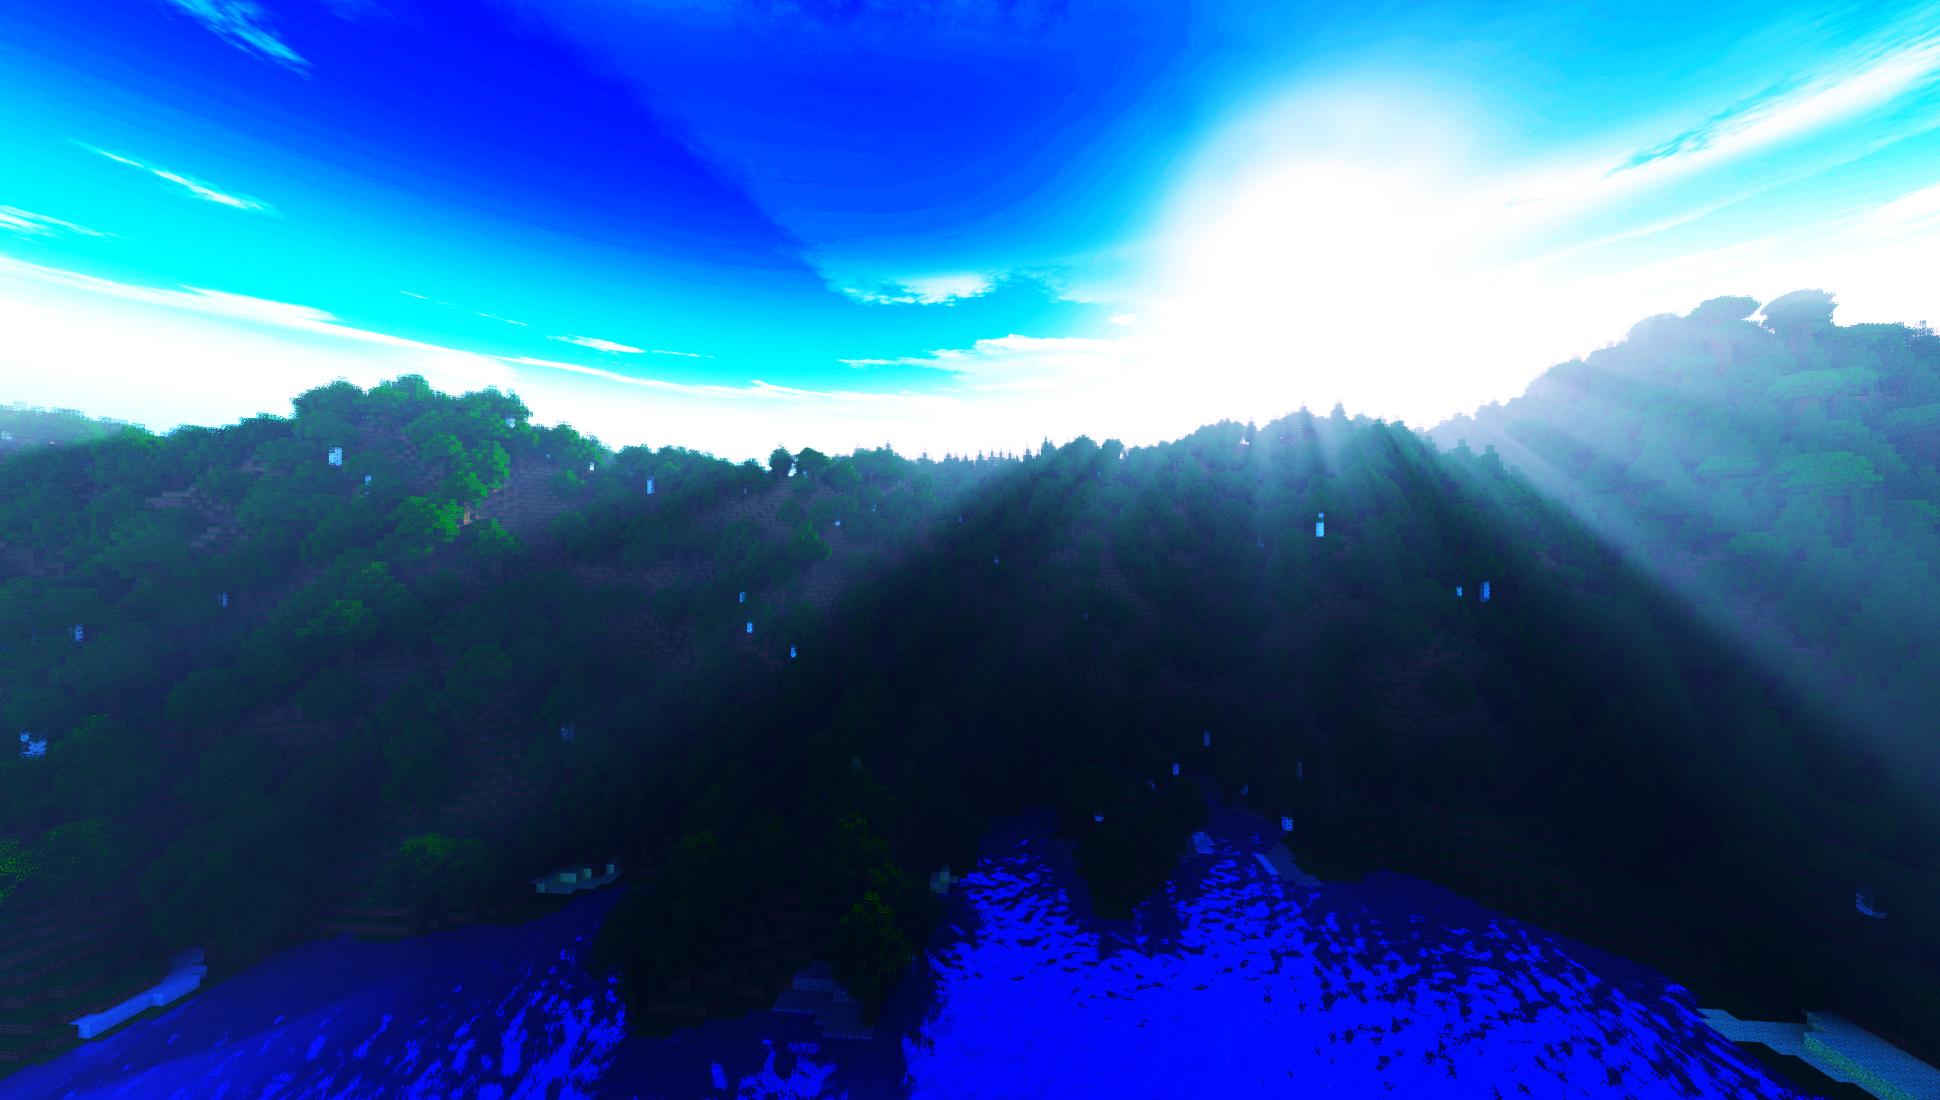 [Minecraft] 'Good Morning' by SunflowerTwix